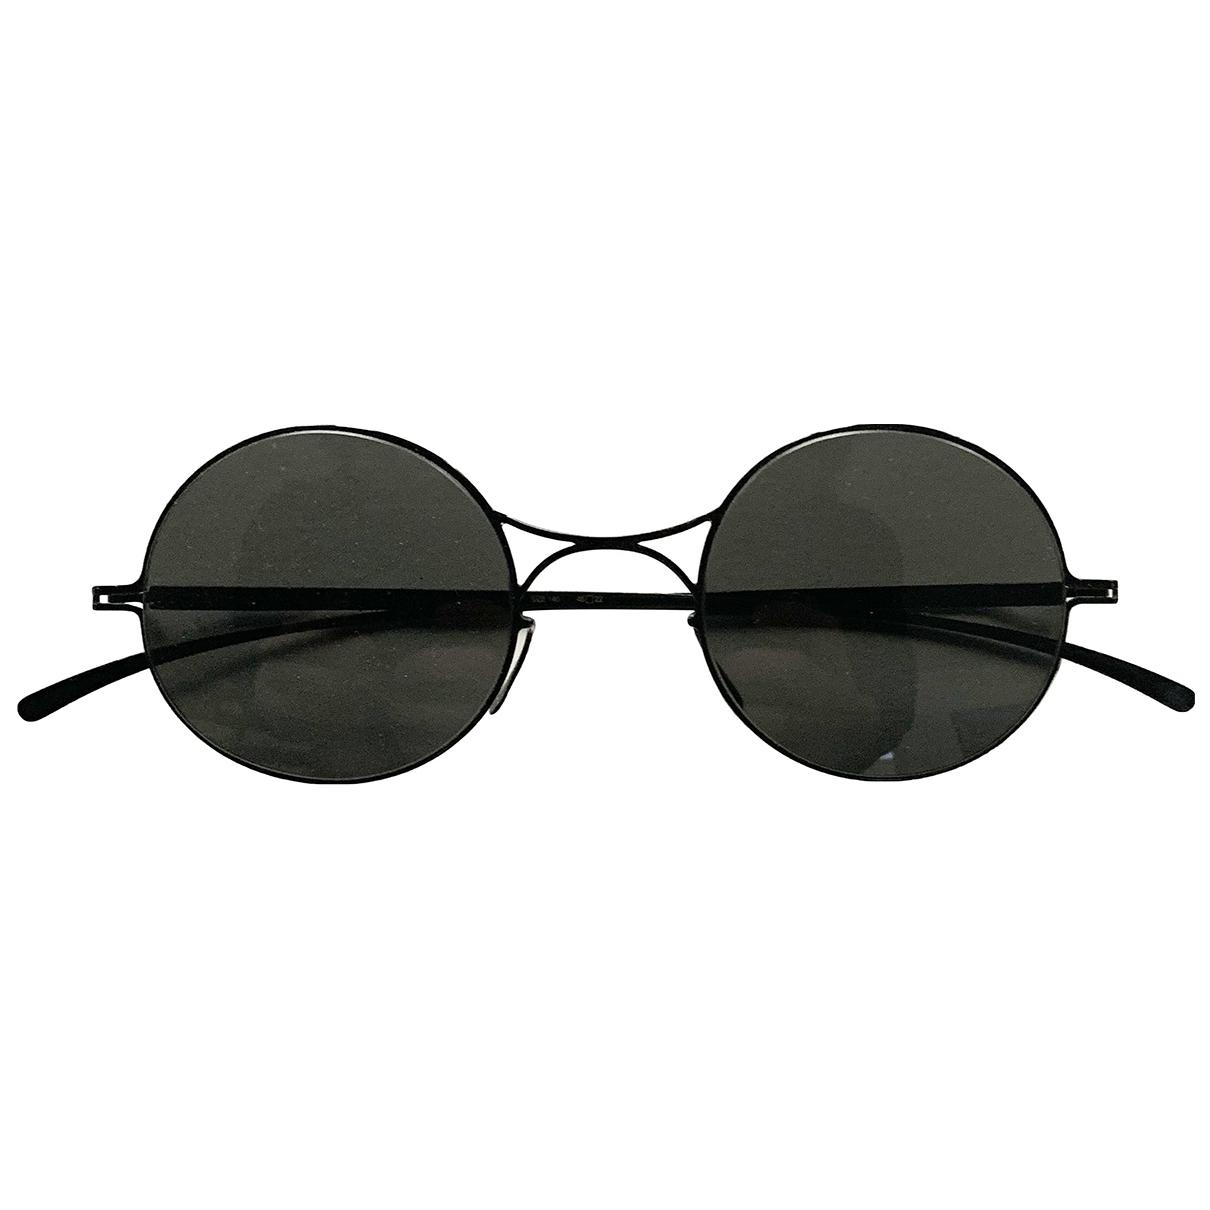 Gafas Maison Martin Margiela